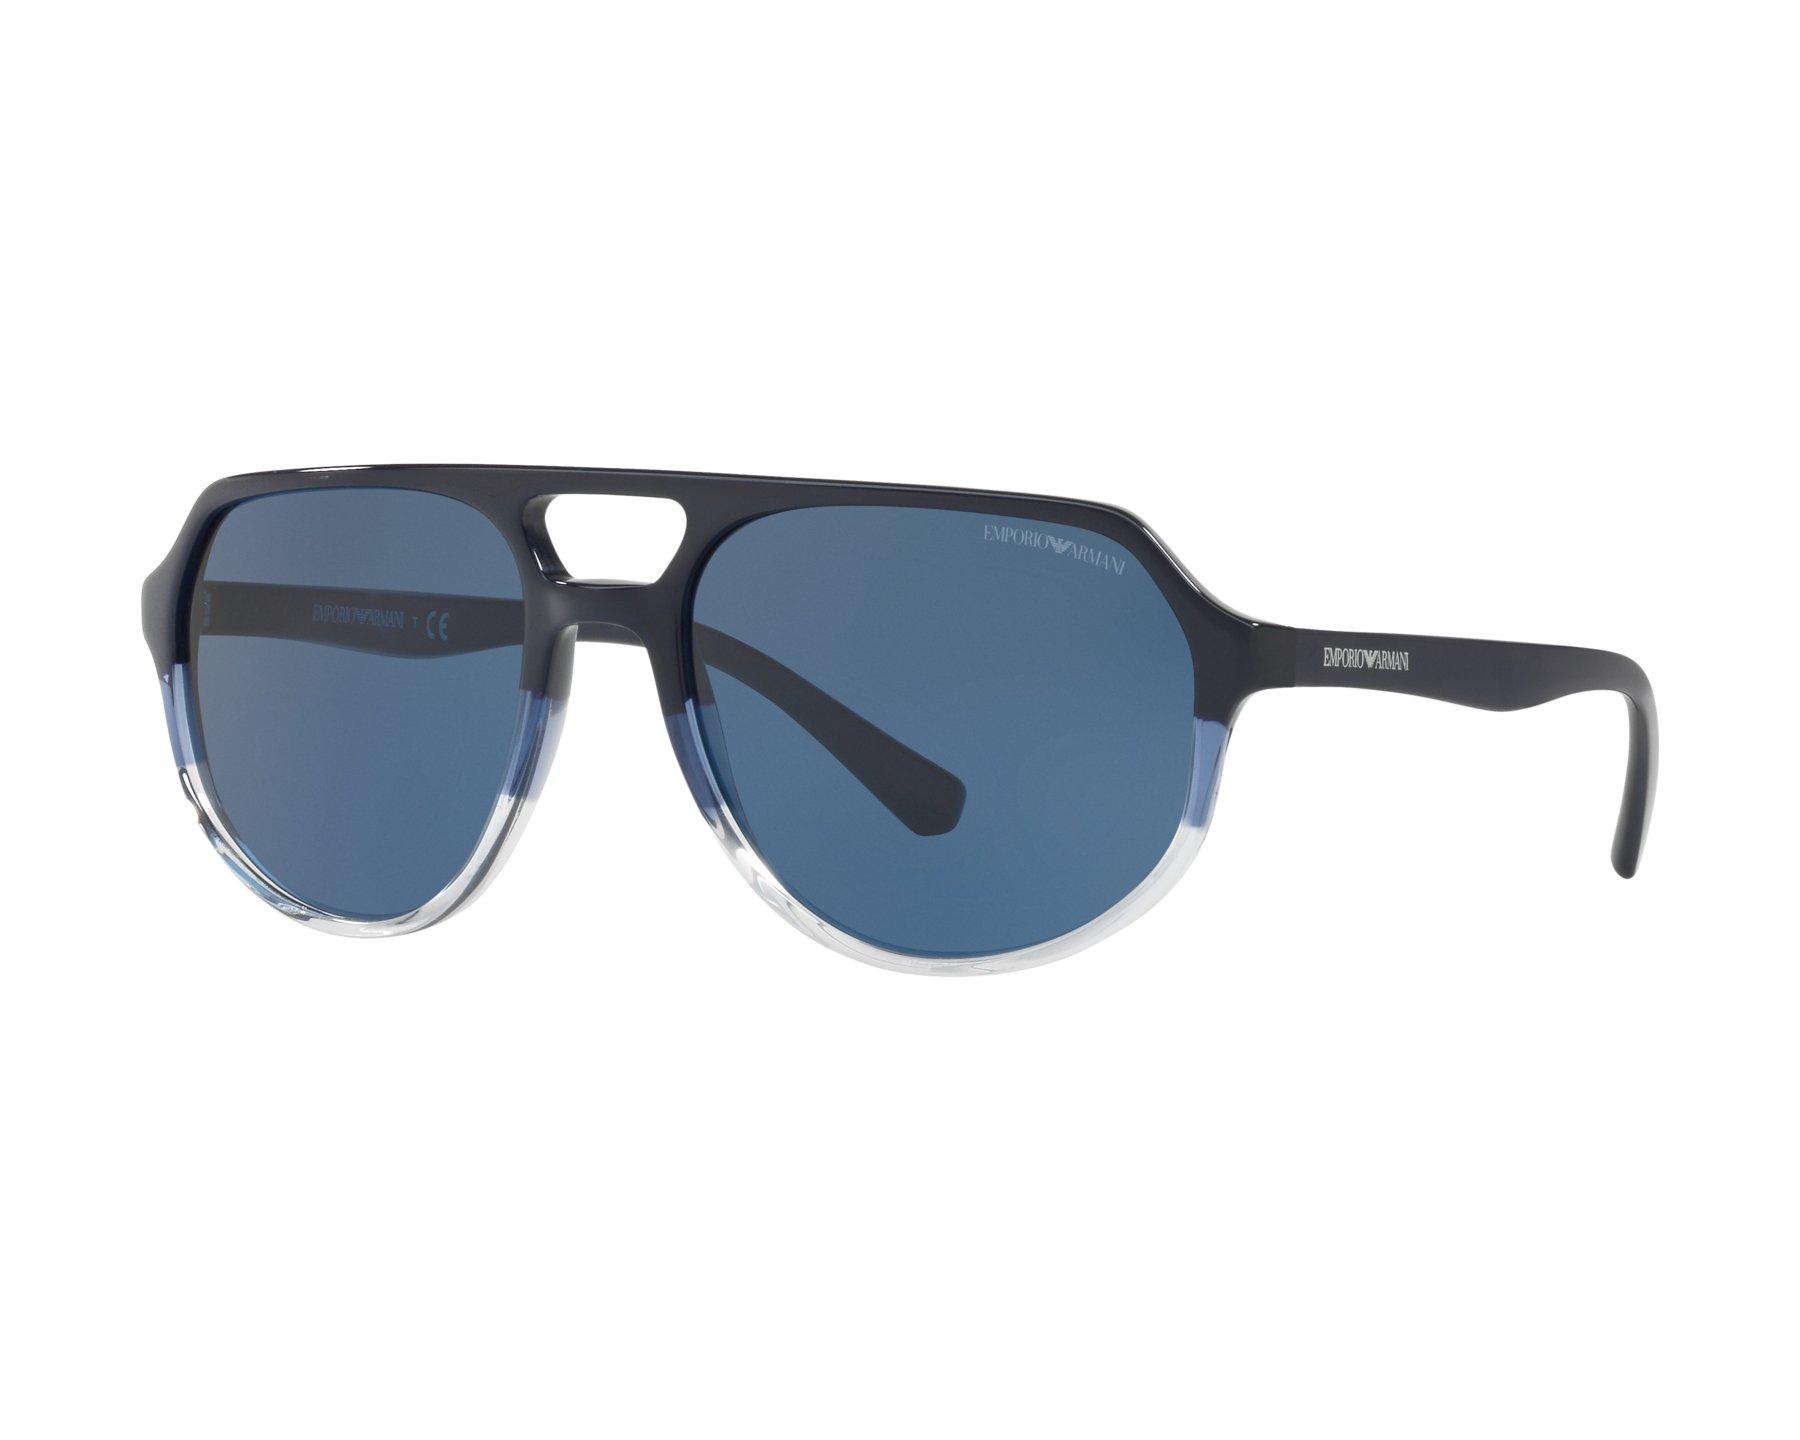 Emporio Armani Herren Sonnenbrille » EA4111«, blau, 562980 - blau/blau